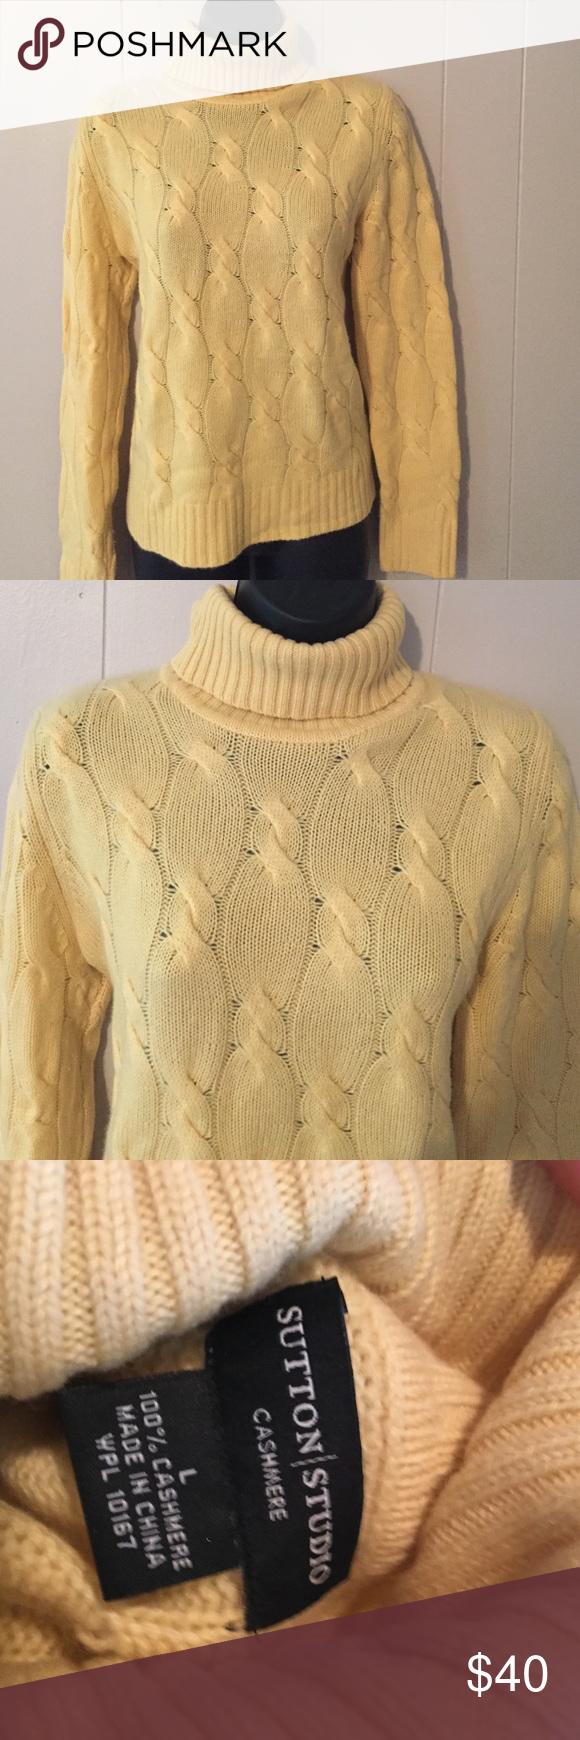 100% Cashmere Turtleneck Cable Knit Sweater NWOT. Sutton Studio ...